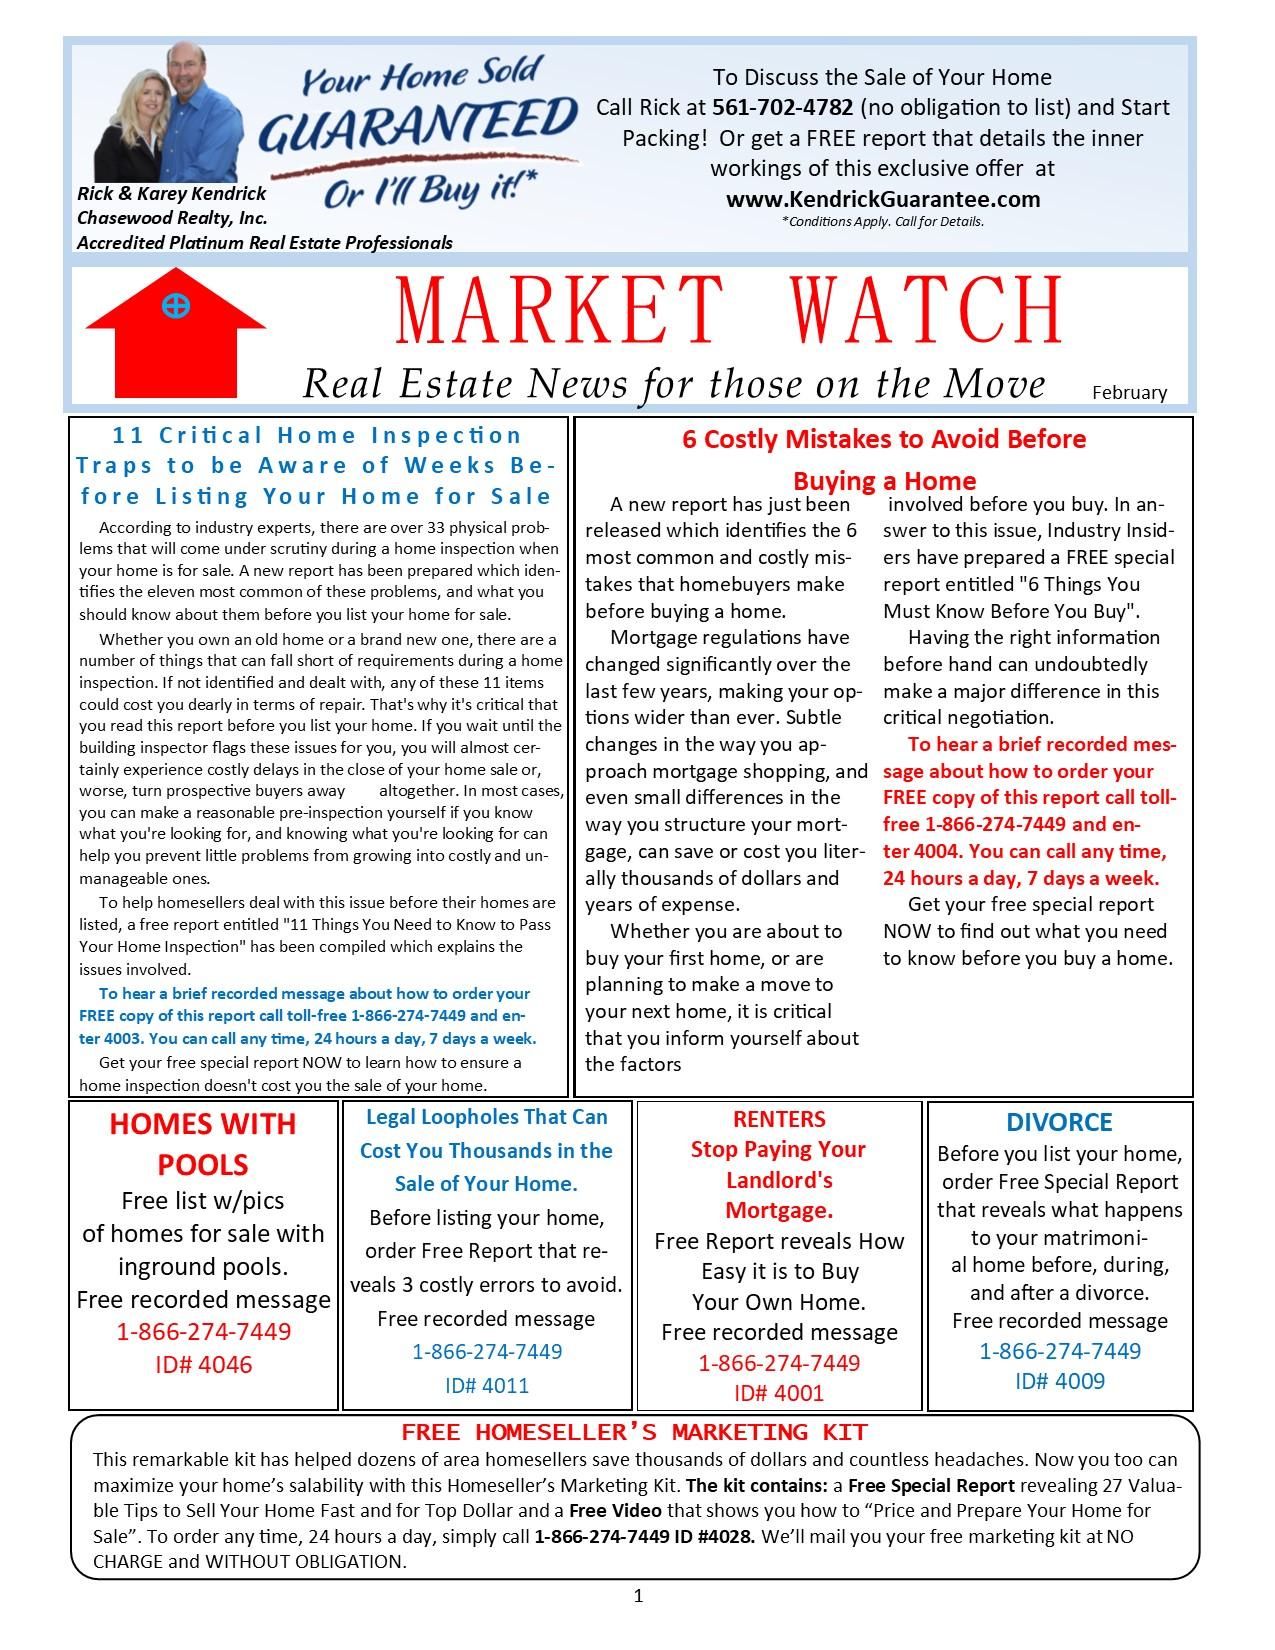 MarketWatch February 2020.jpg